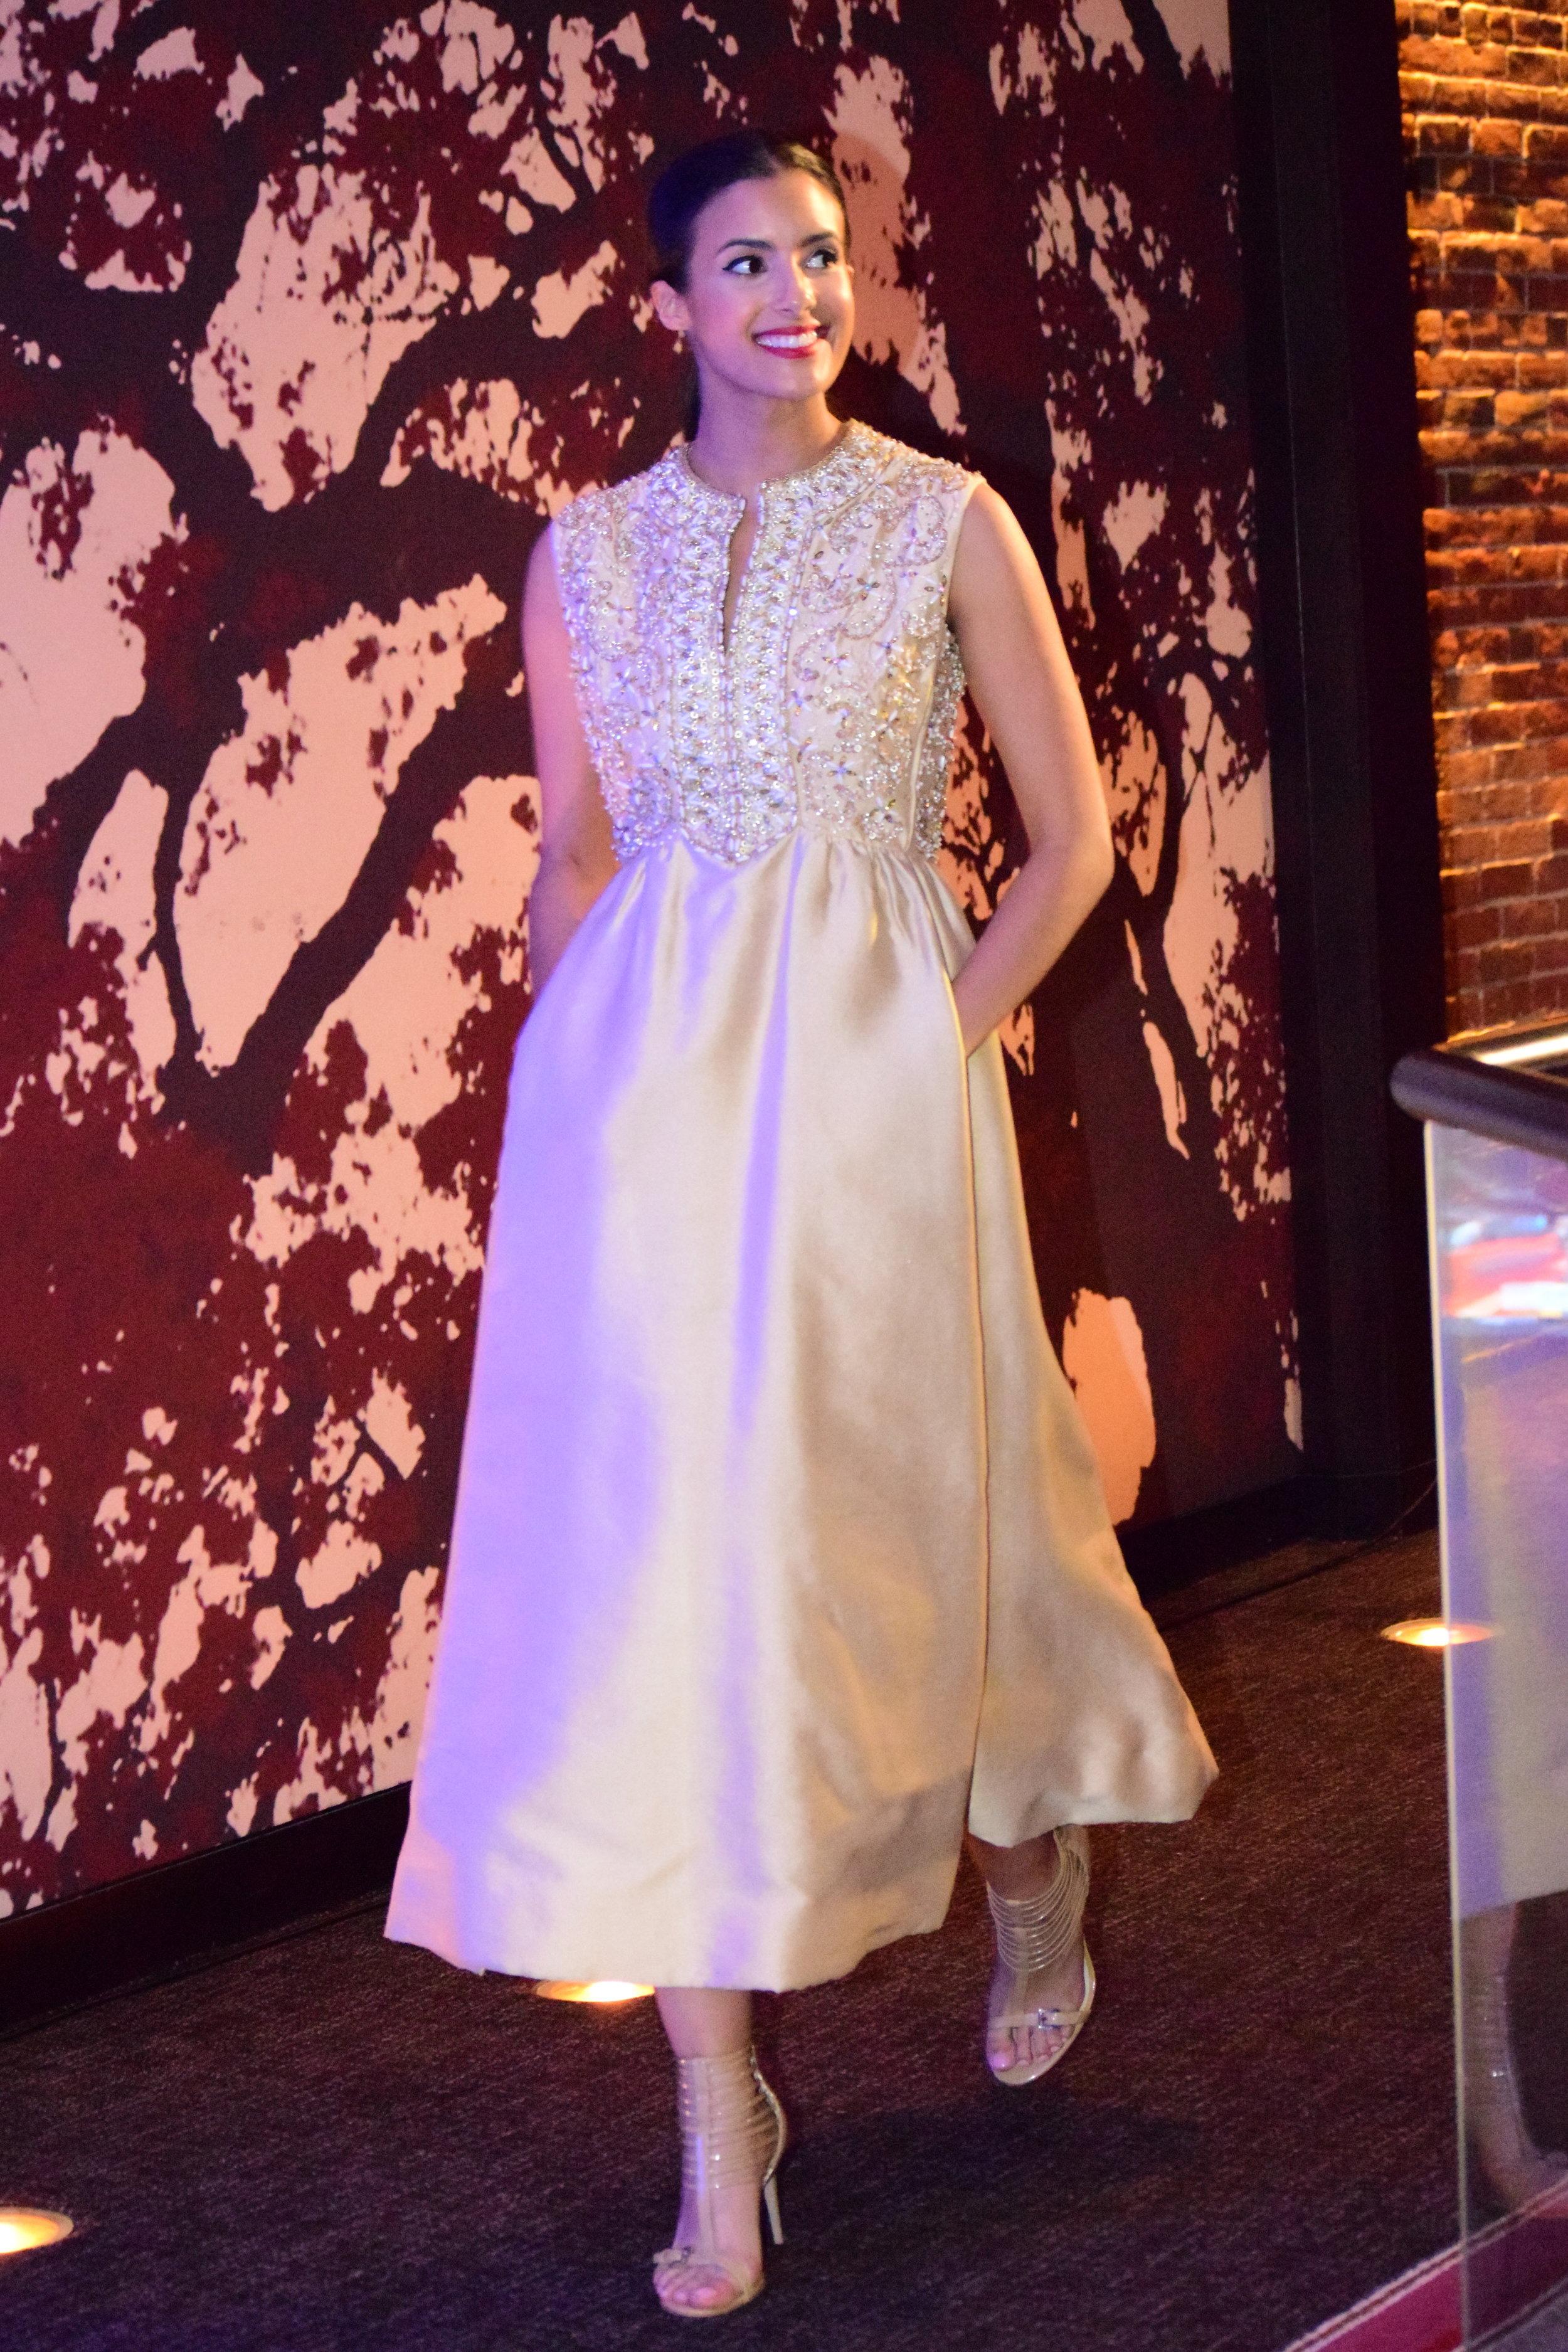 FashionablyLate_Oonas Boston (7).JPG